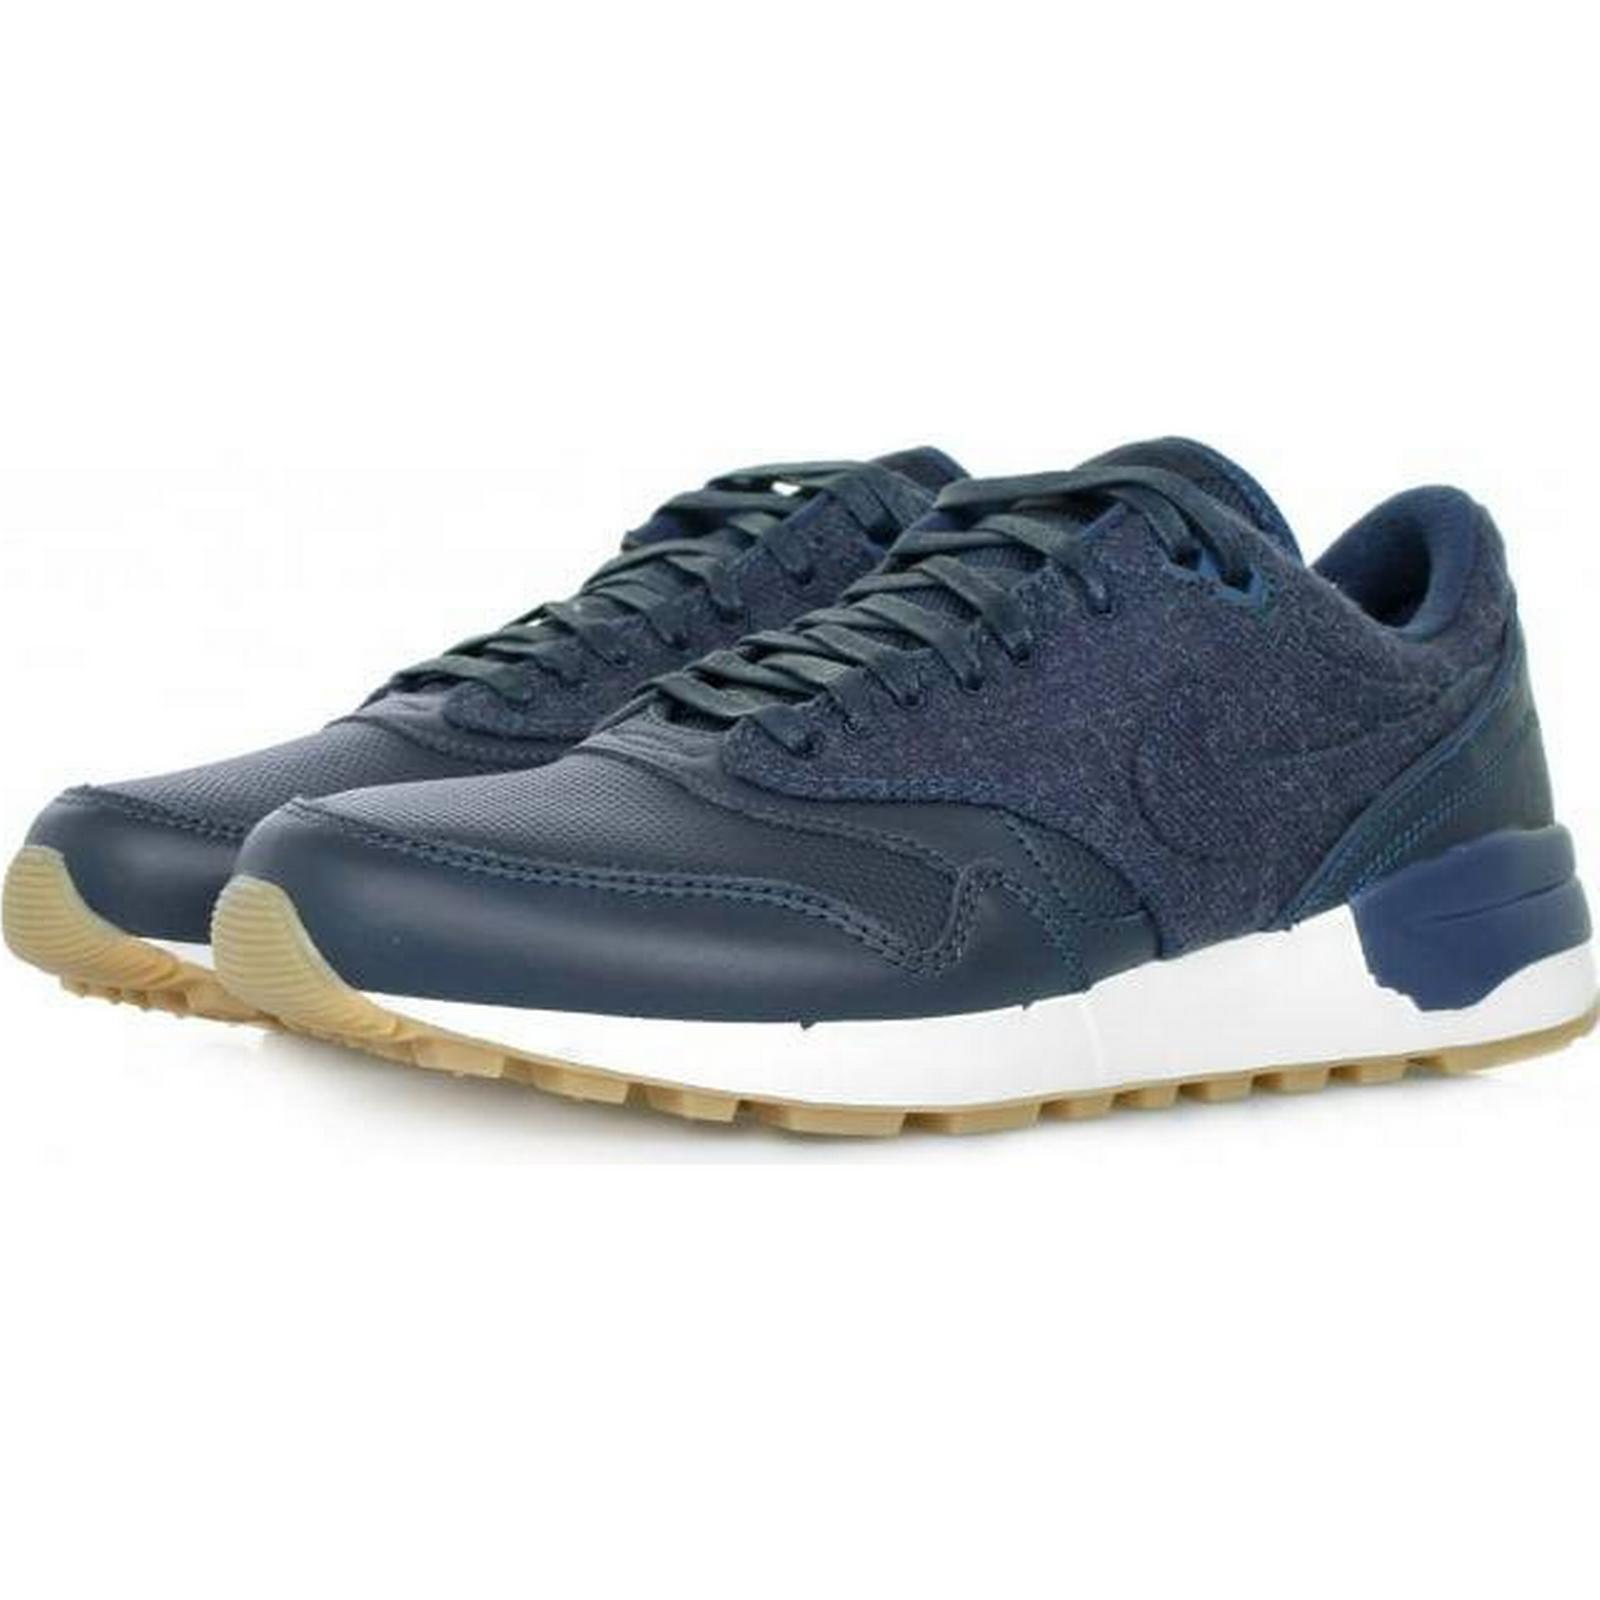 Nike LX Air Odyssey LX Nike Navy Shoe 806811 400 fe1e2c